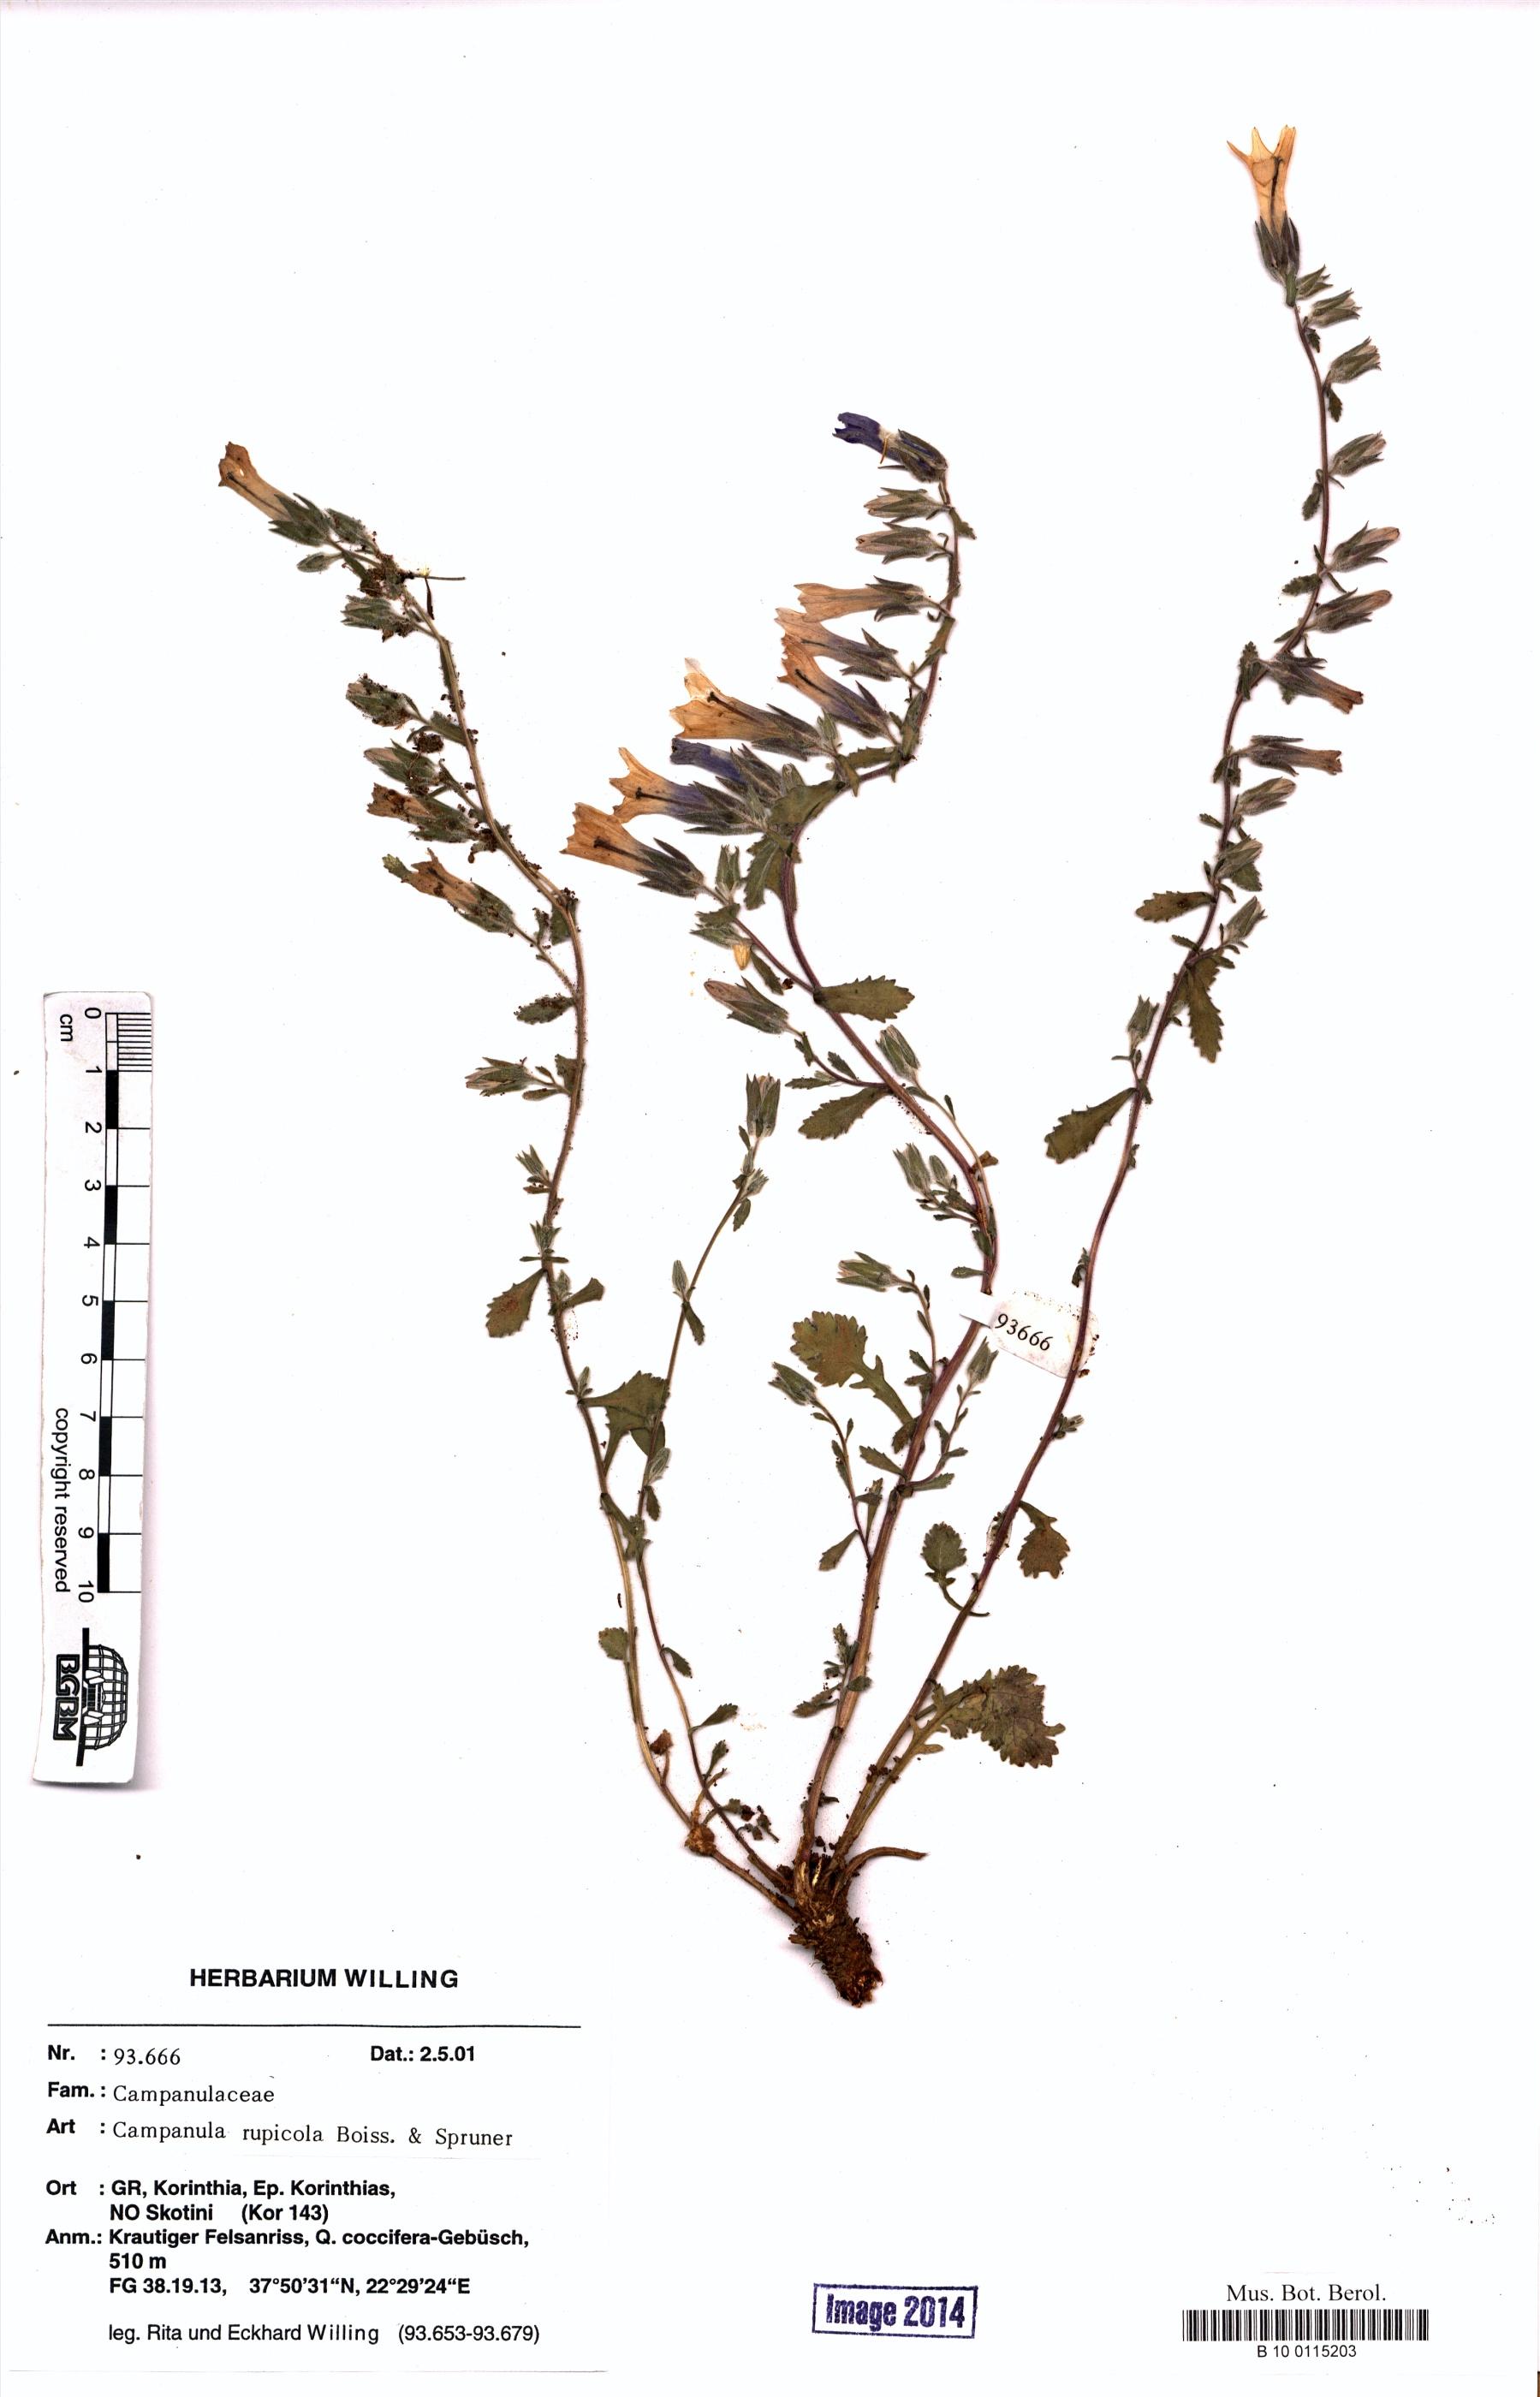 http://ww2.bgbm.org/herbarium/images/B/10/01/15/20/B_10_0115203.jpg